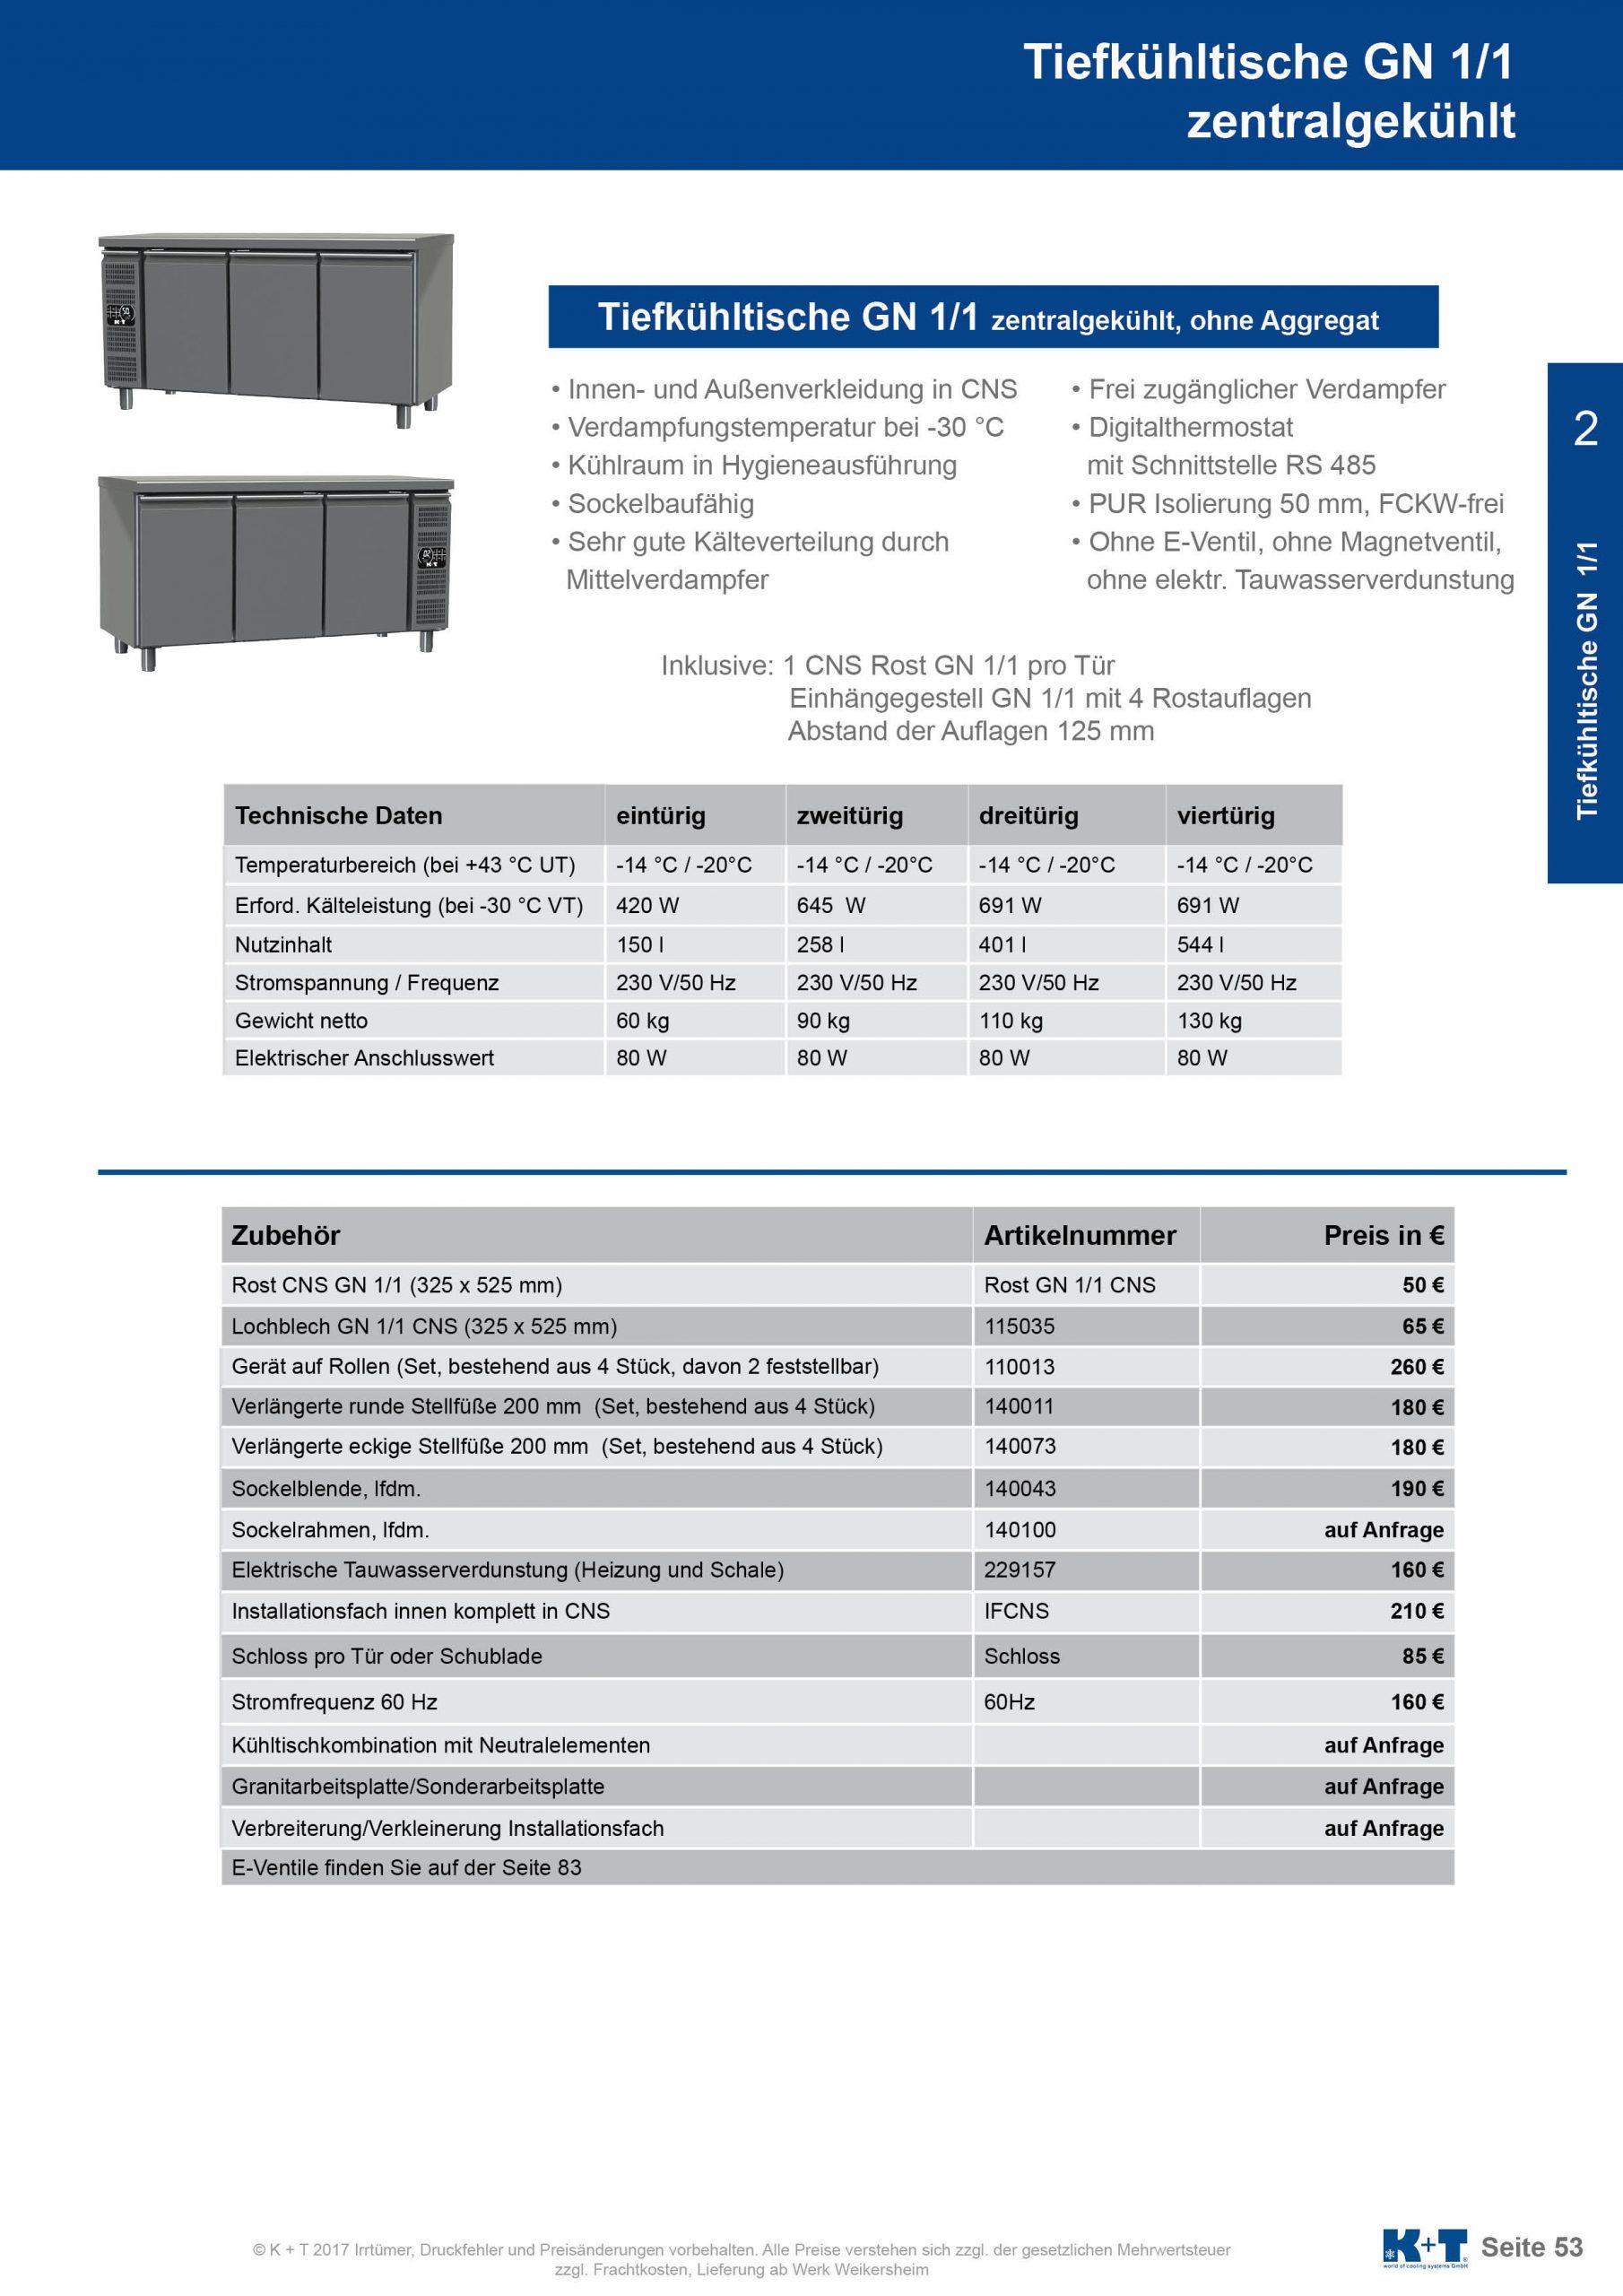 Tiefkühltisch GN 1_1 Korpus 650 zentralgekühlt 2